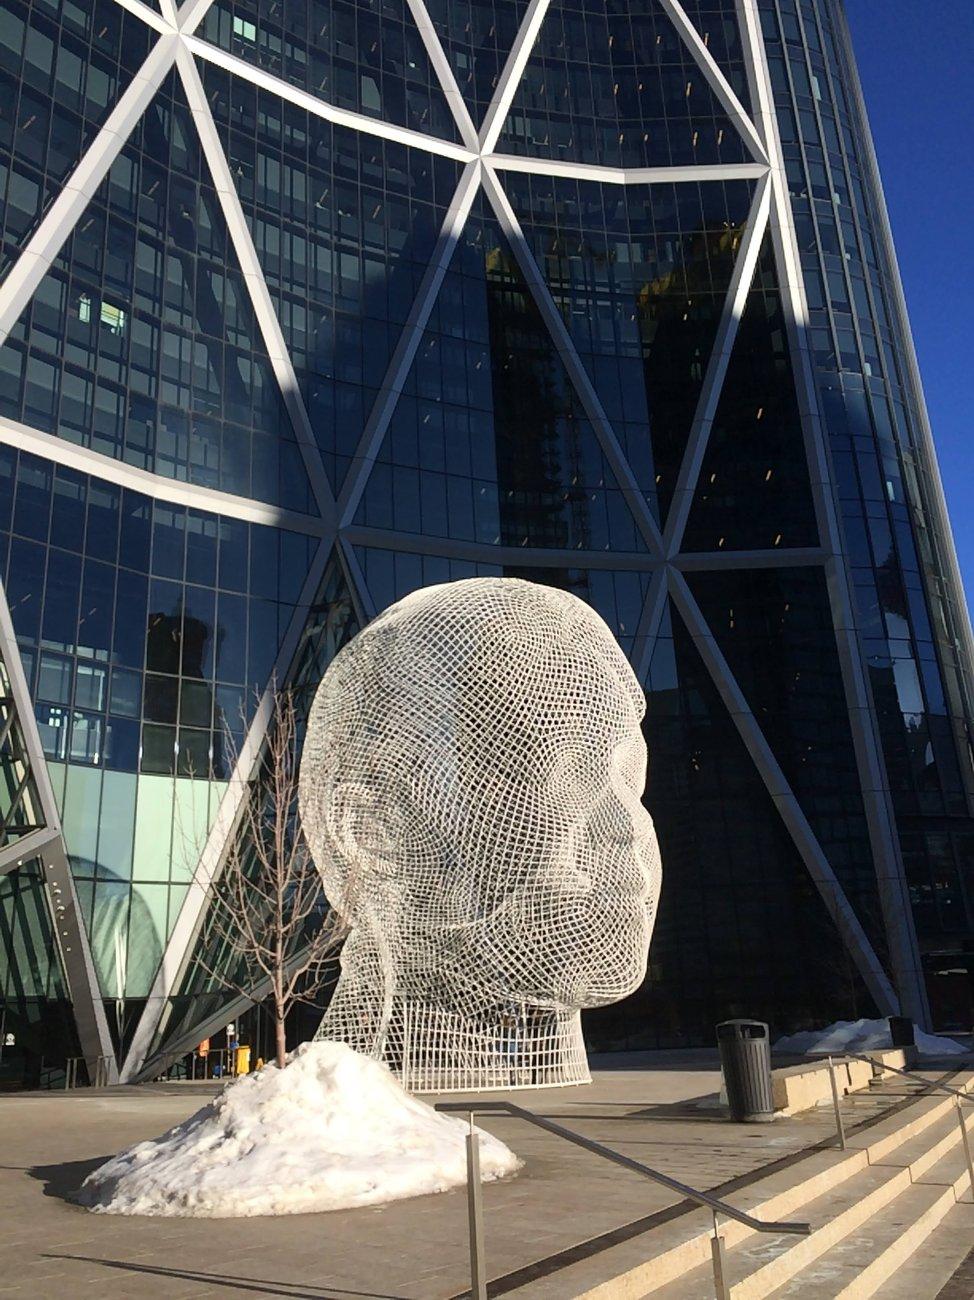 Cool sculpture Calgary Alberta Canada